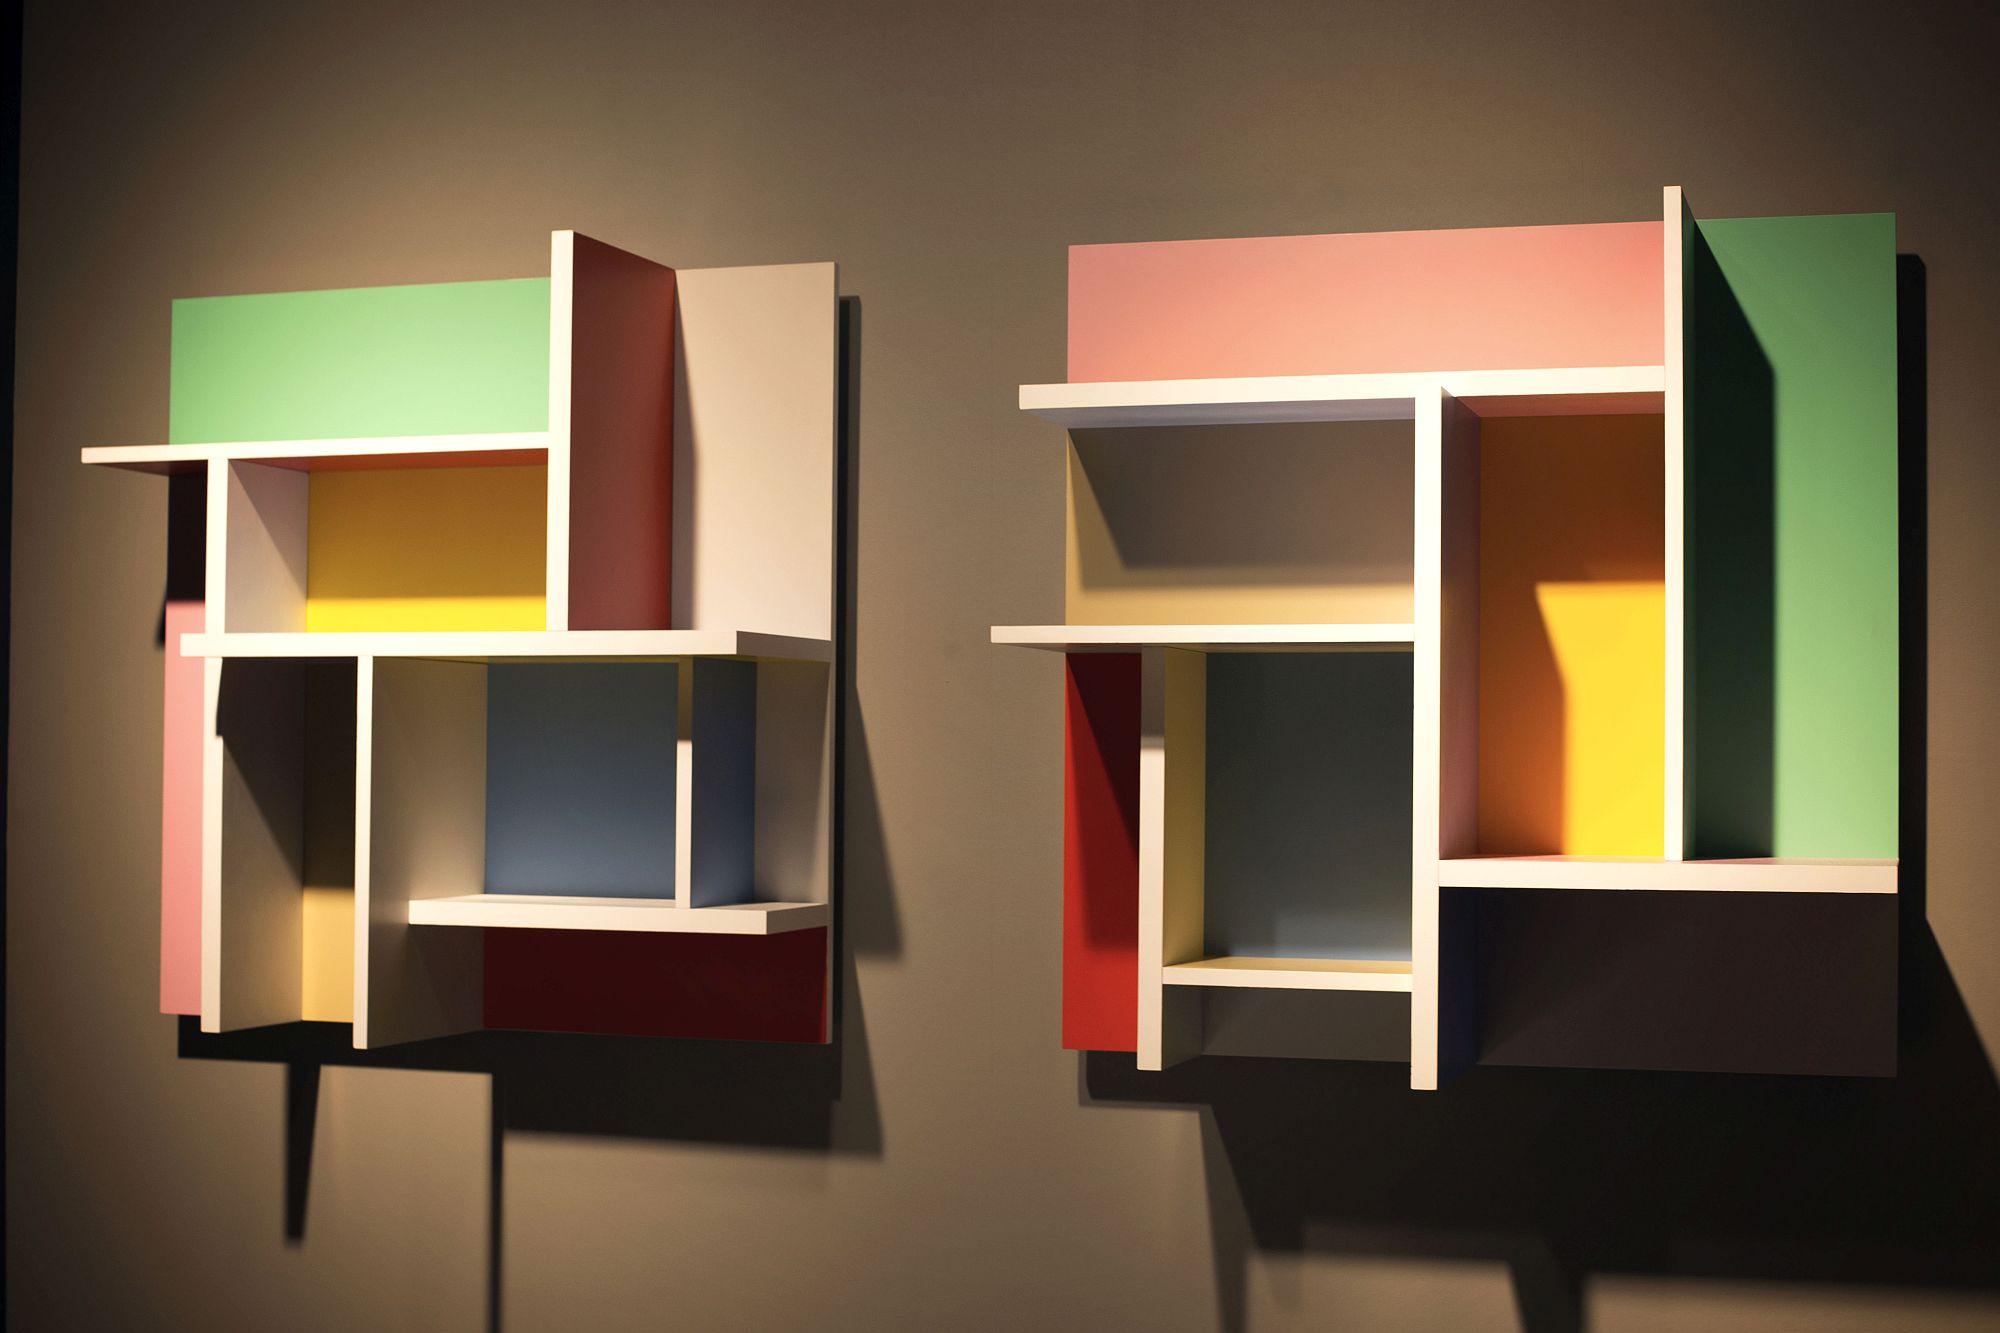 Rak hiasan dinding modular warna-warni